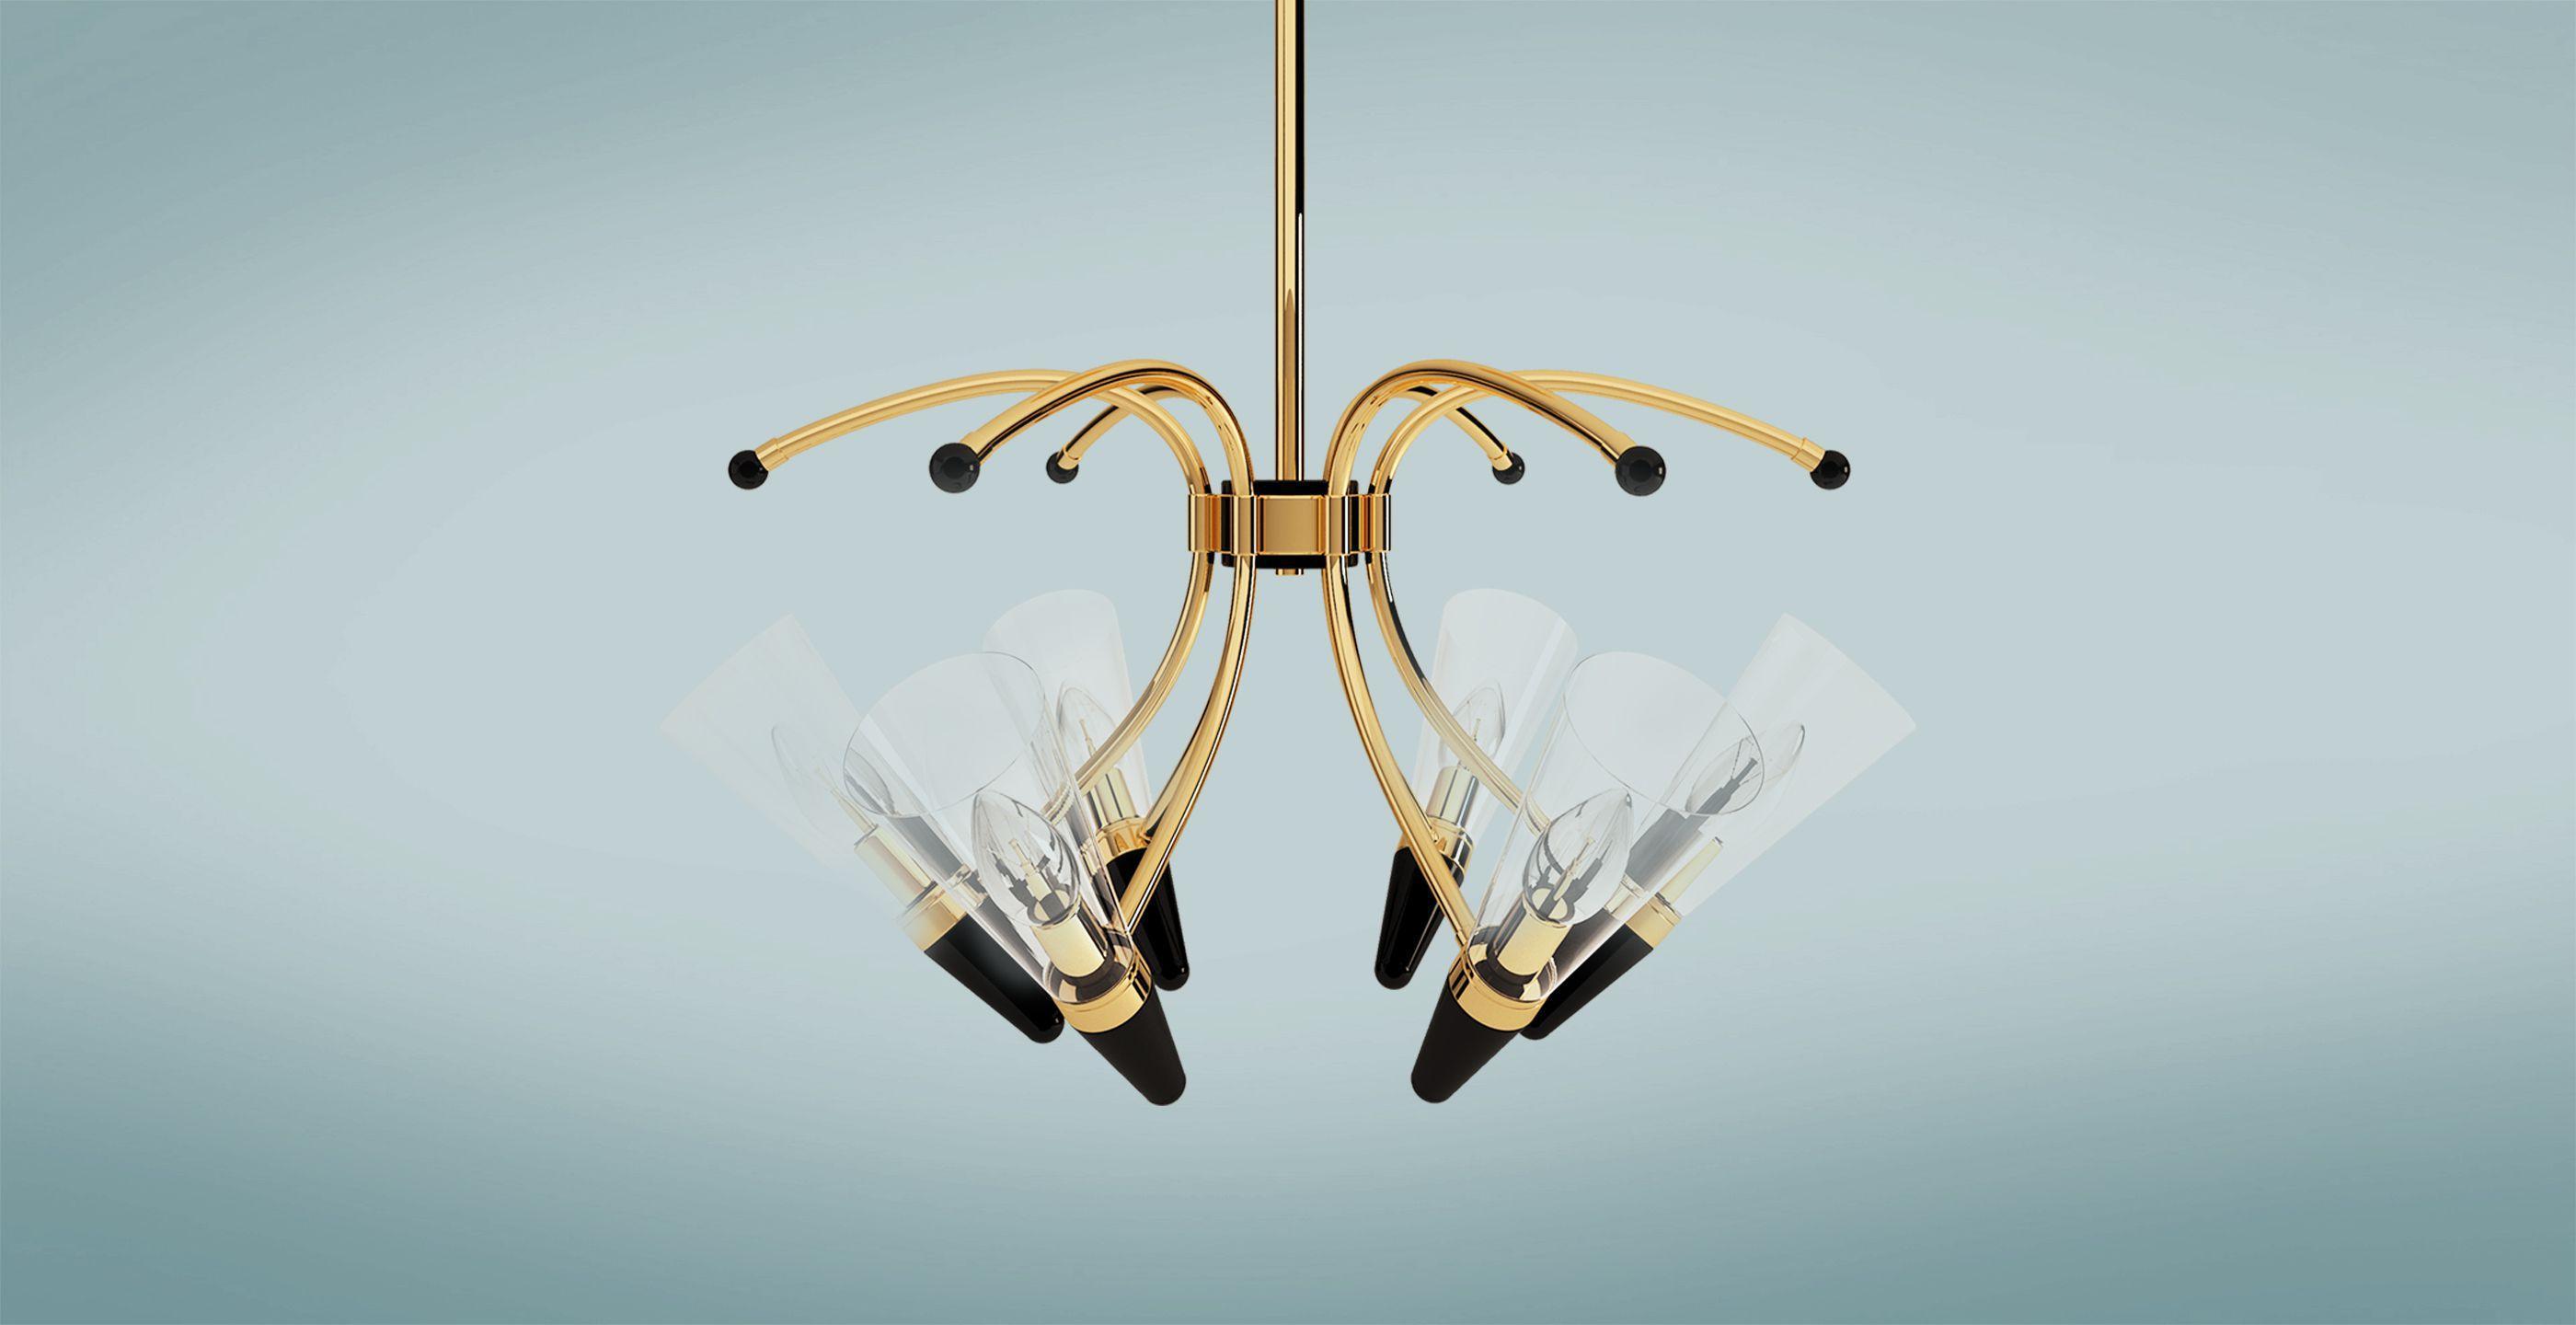 Buena Vista Suspension Lamp